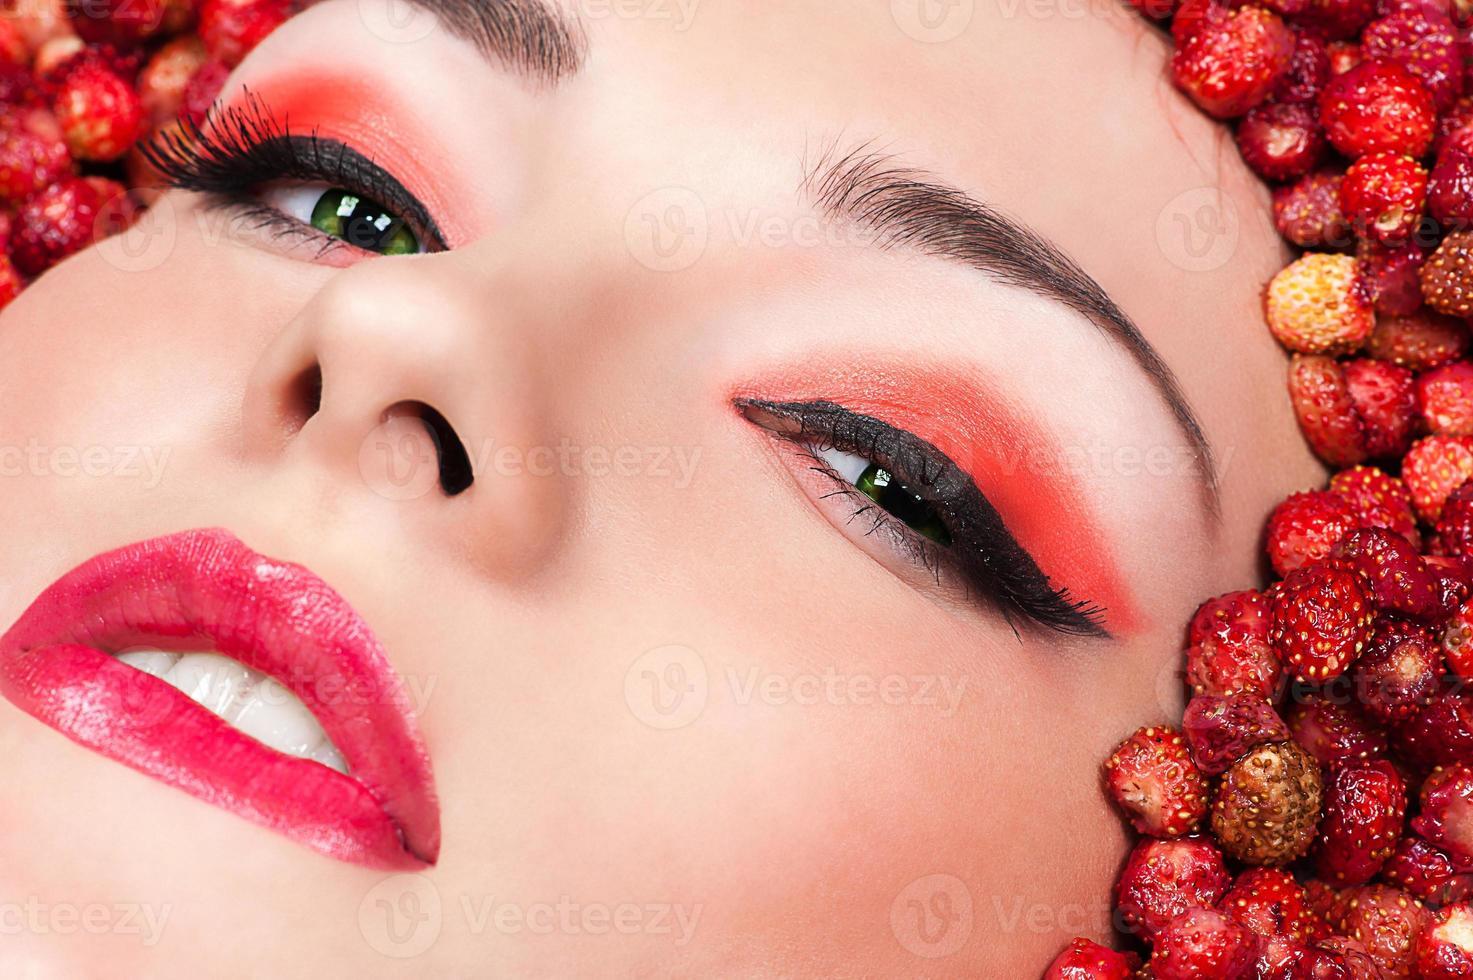 femme, dans, fraise sauvage, gros plan photo